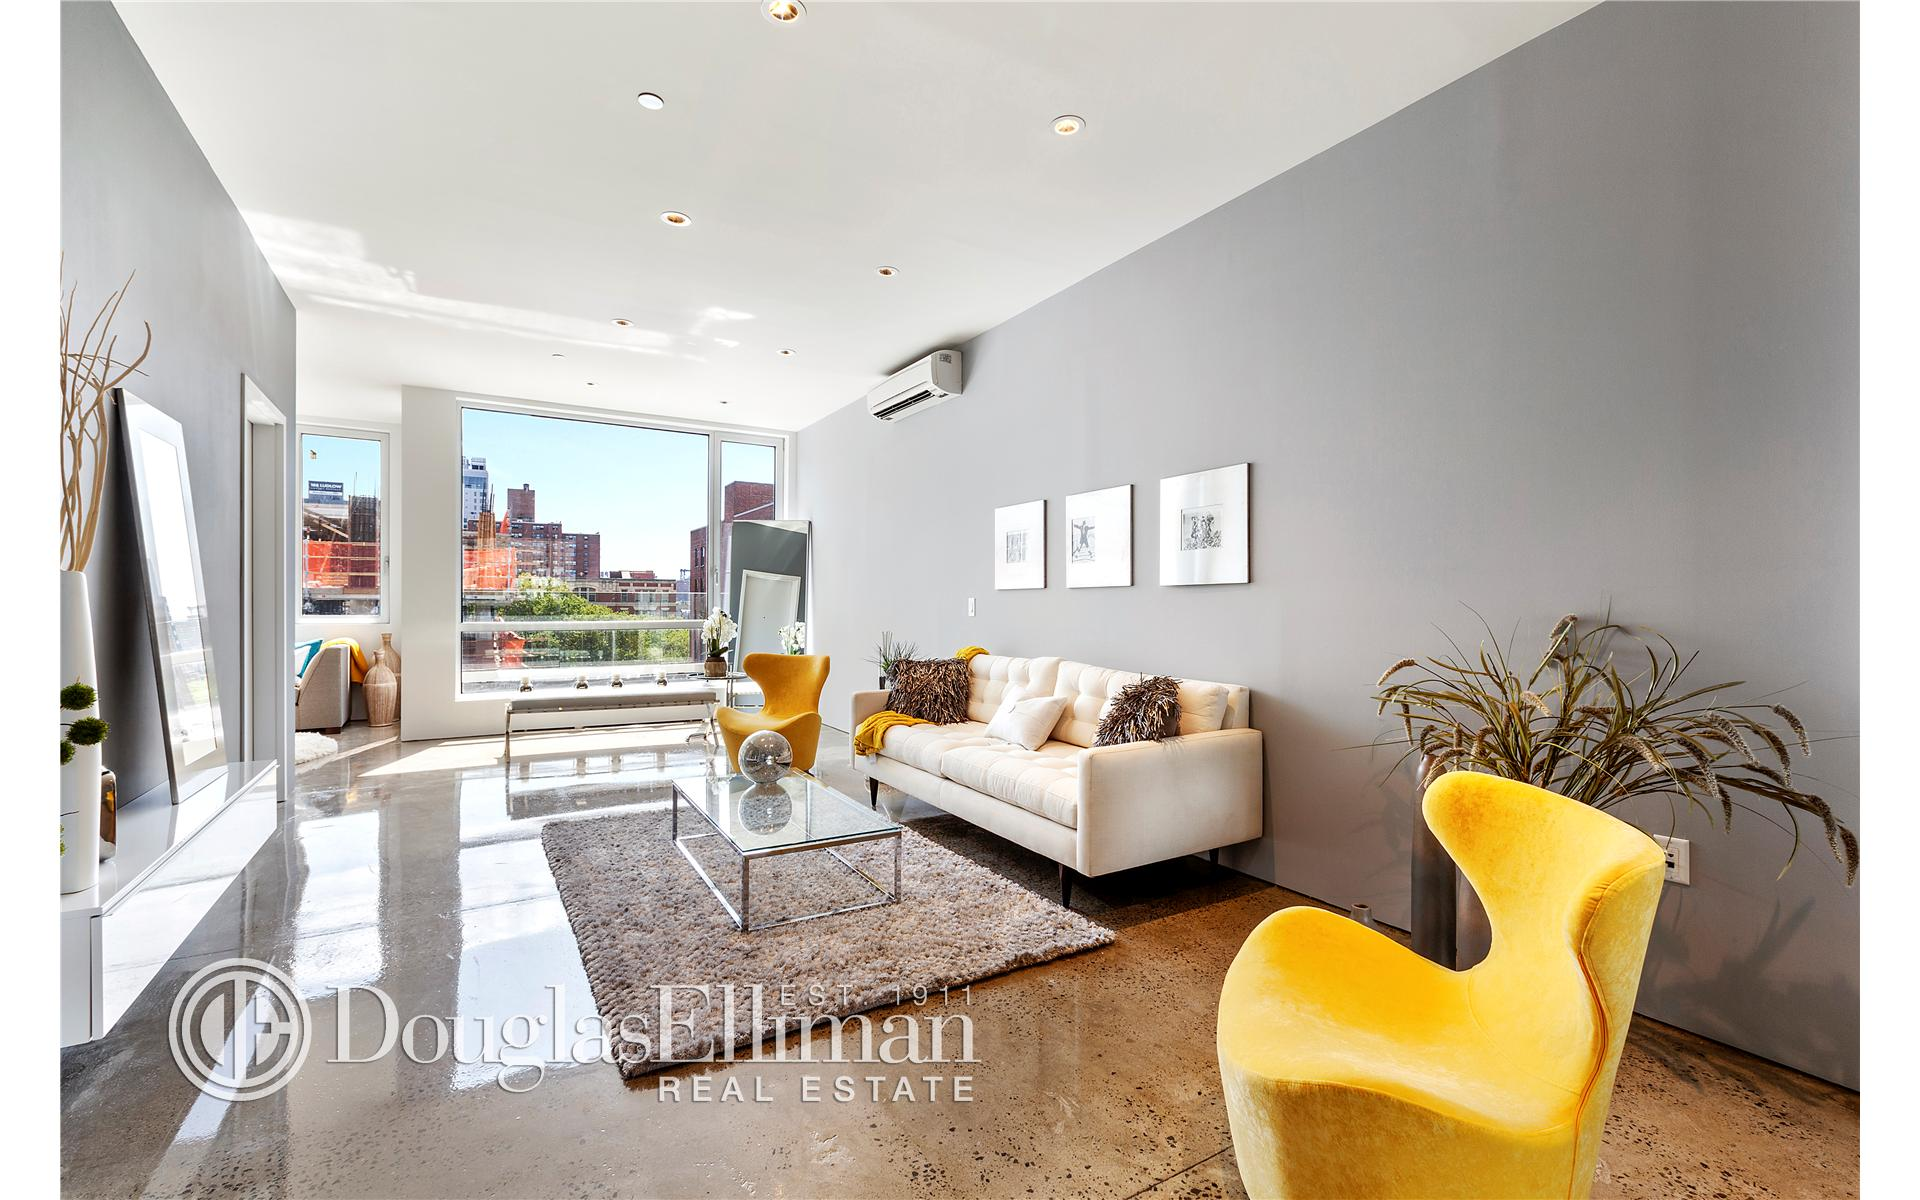 Condominium for Sale at 255 Bowery New York, New York 10002 United States